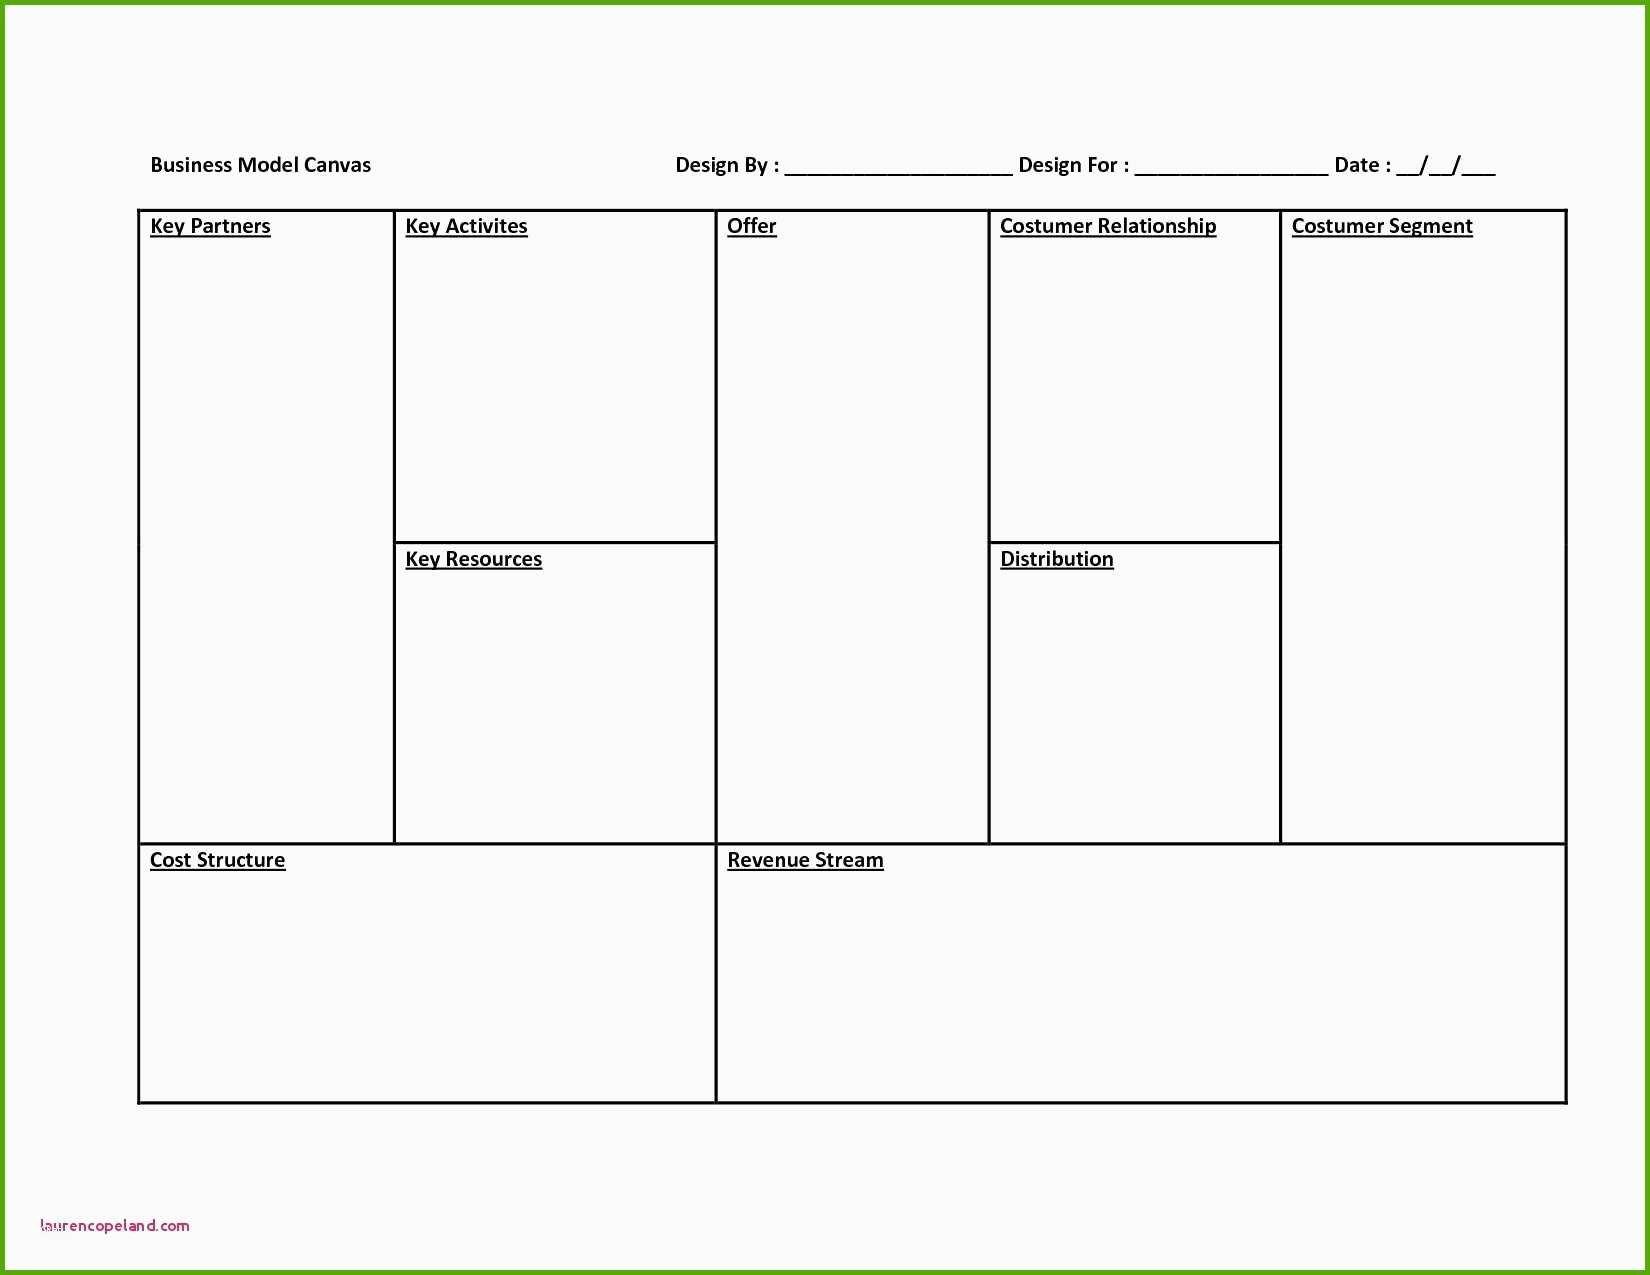 Phänomenal Business Model Canvas Word Vorlage Für Deinen Erfolg Intended For Business Model Canvas Word Template Download